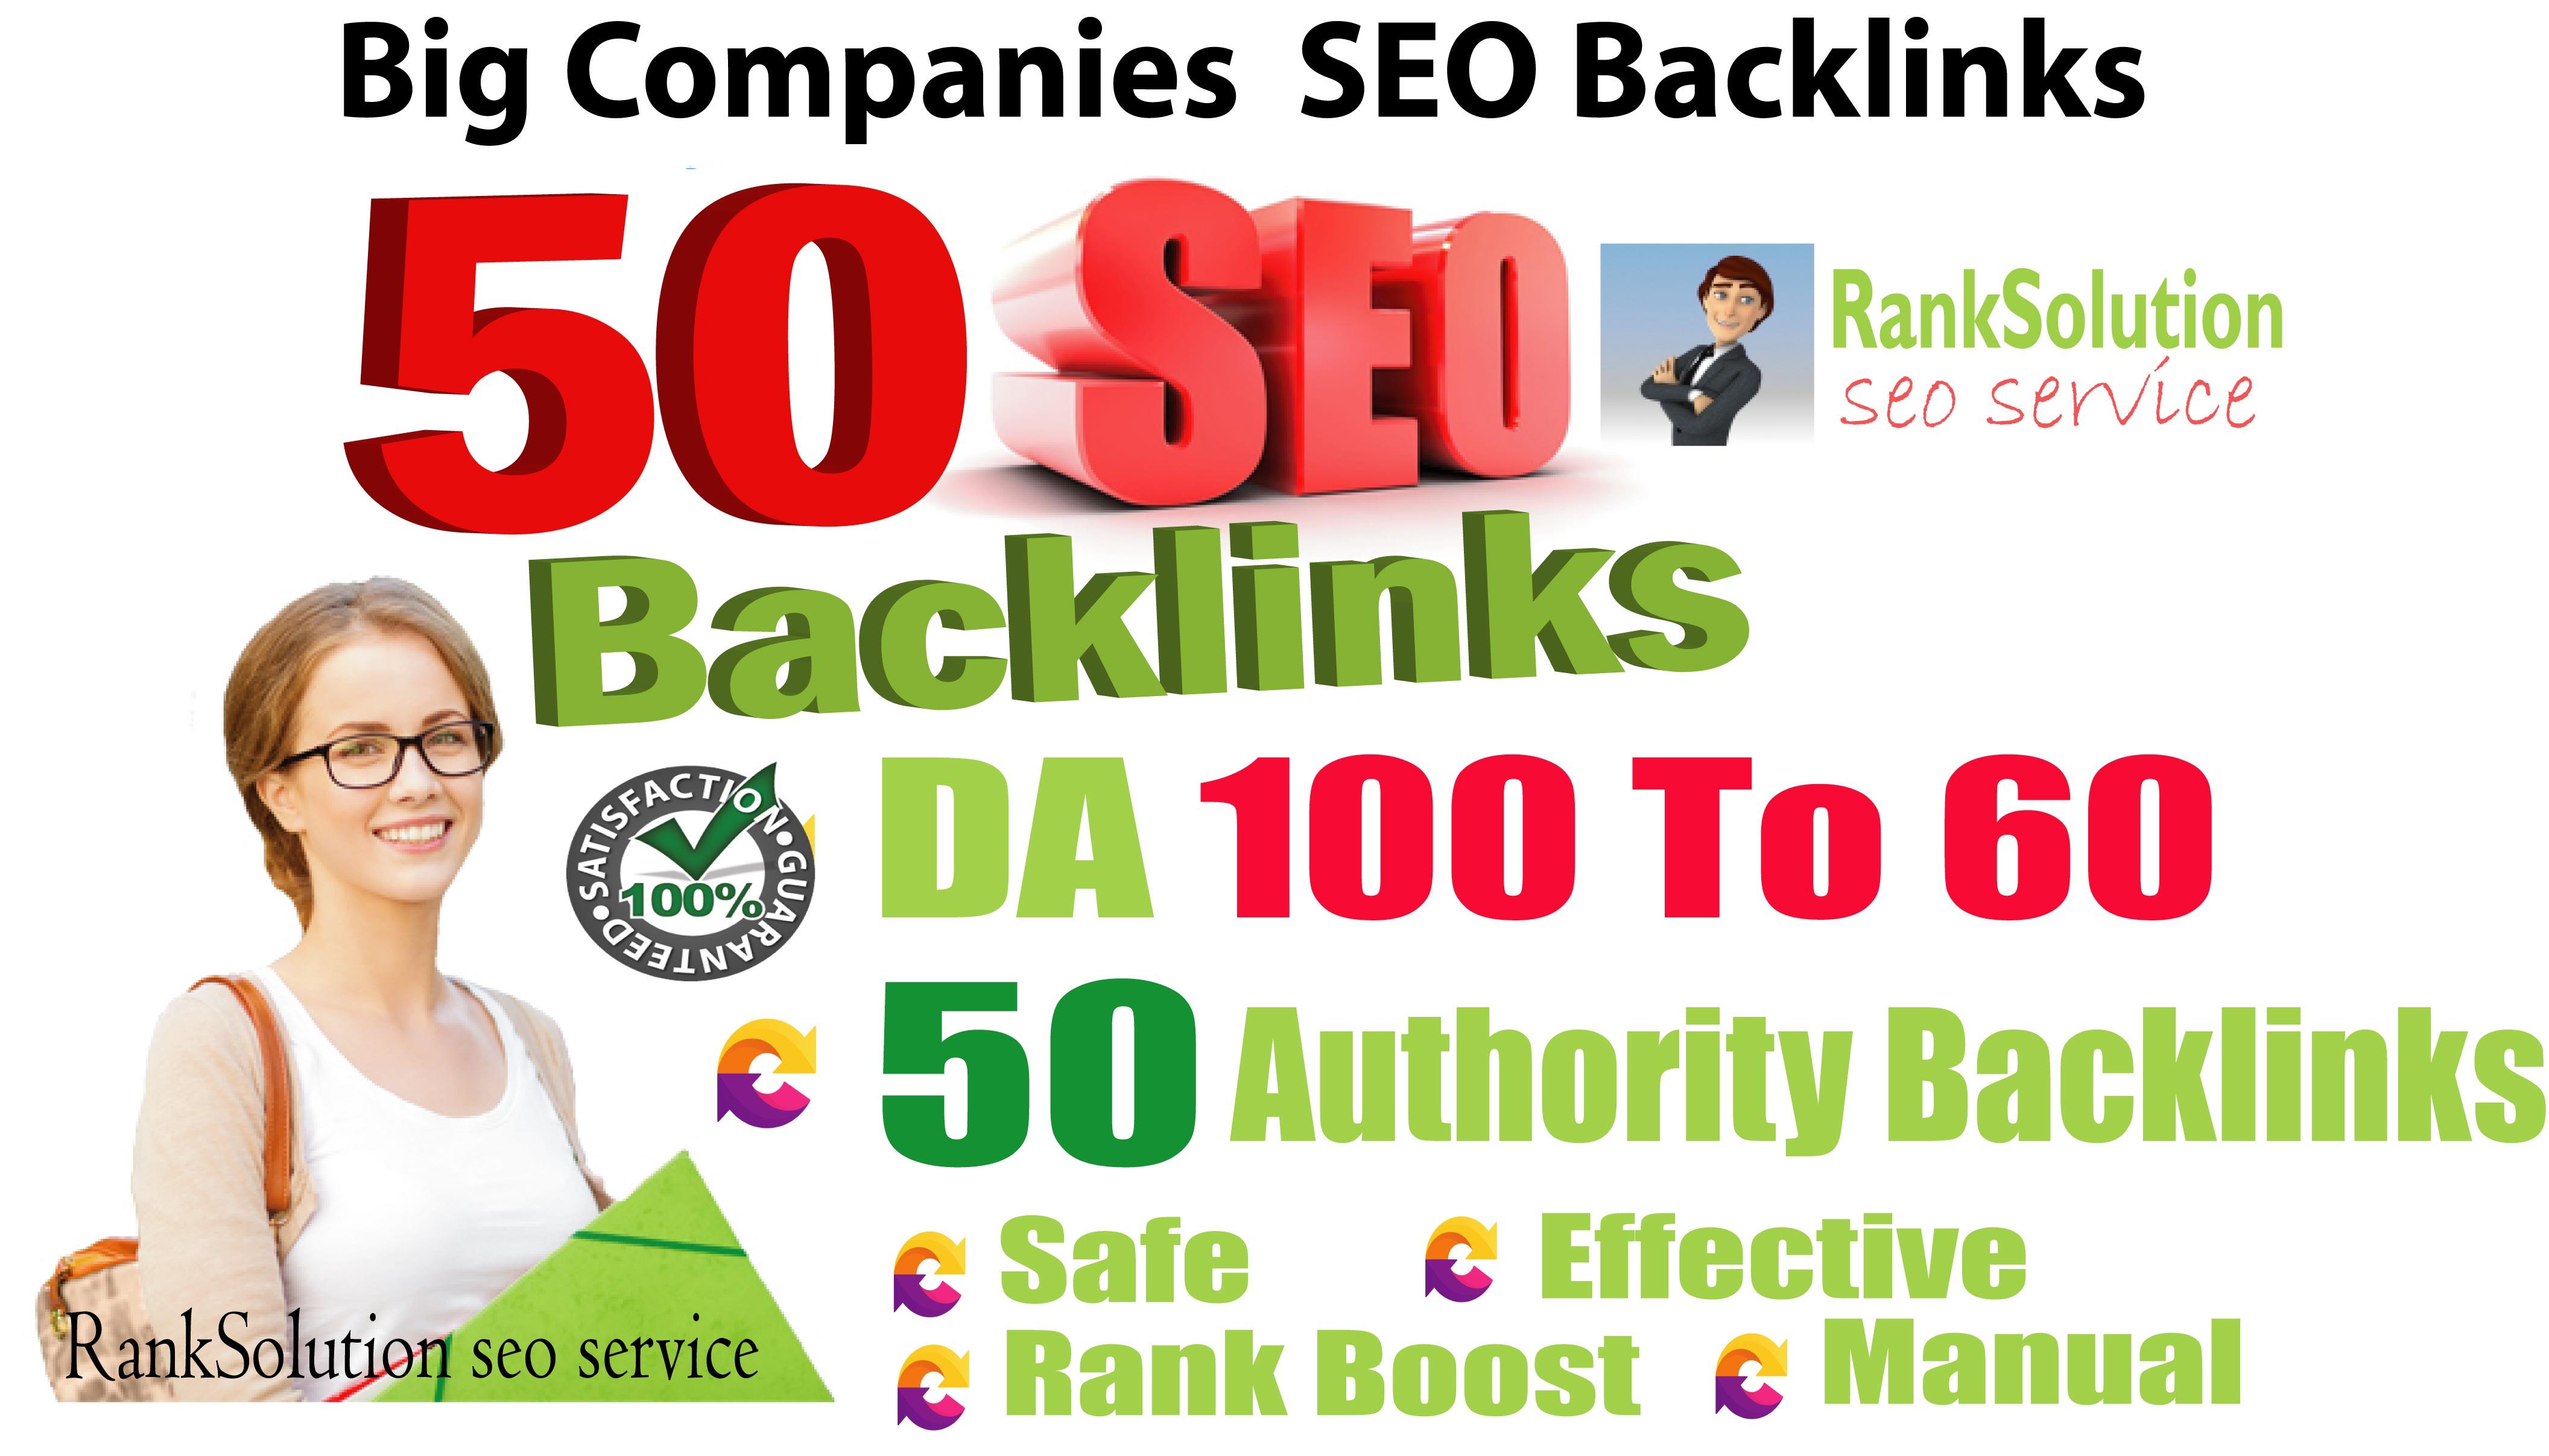 Create 50 Big Companies SEO BackIinks on DA100-60 sites